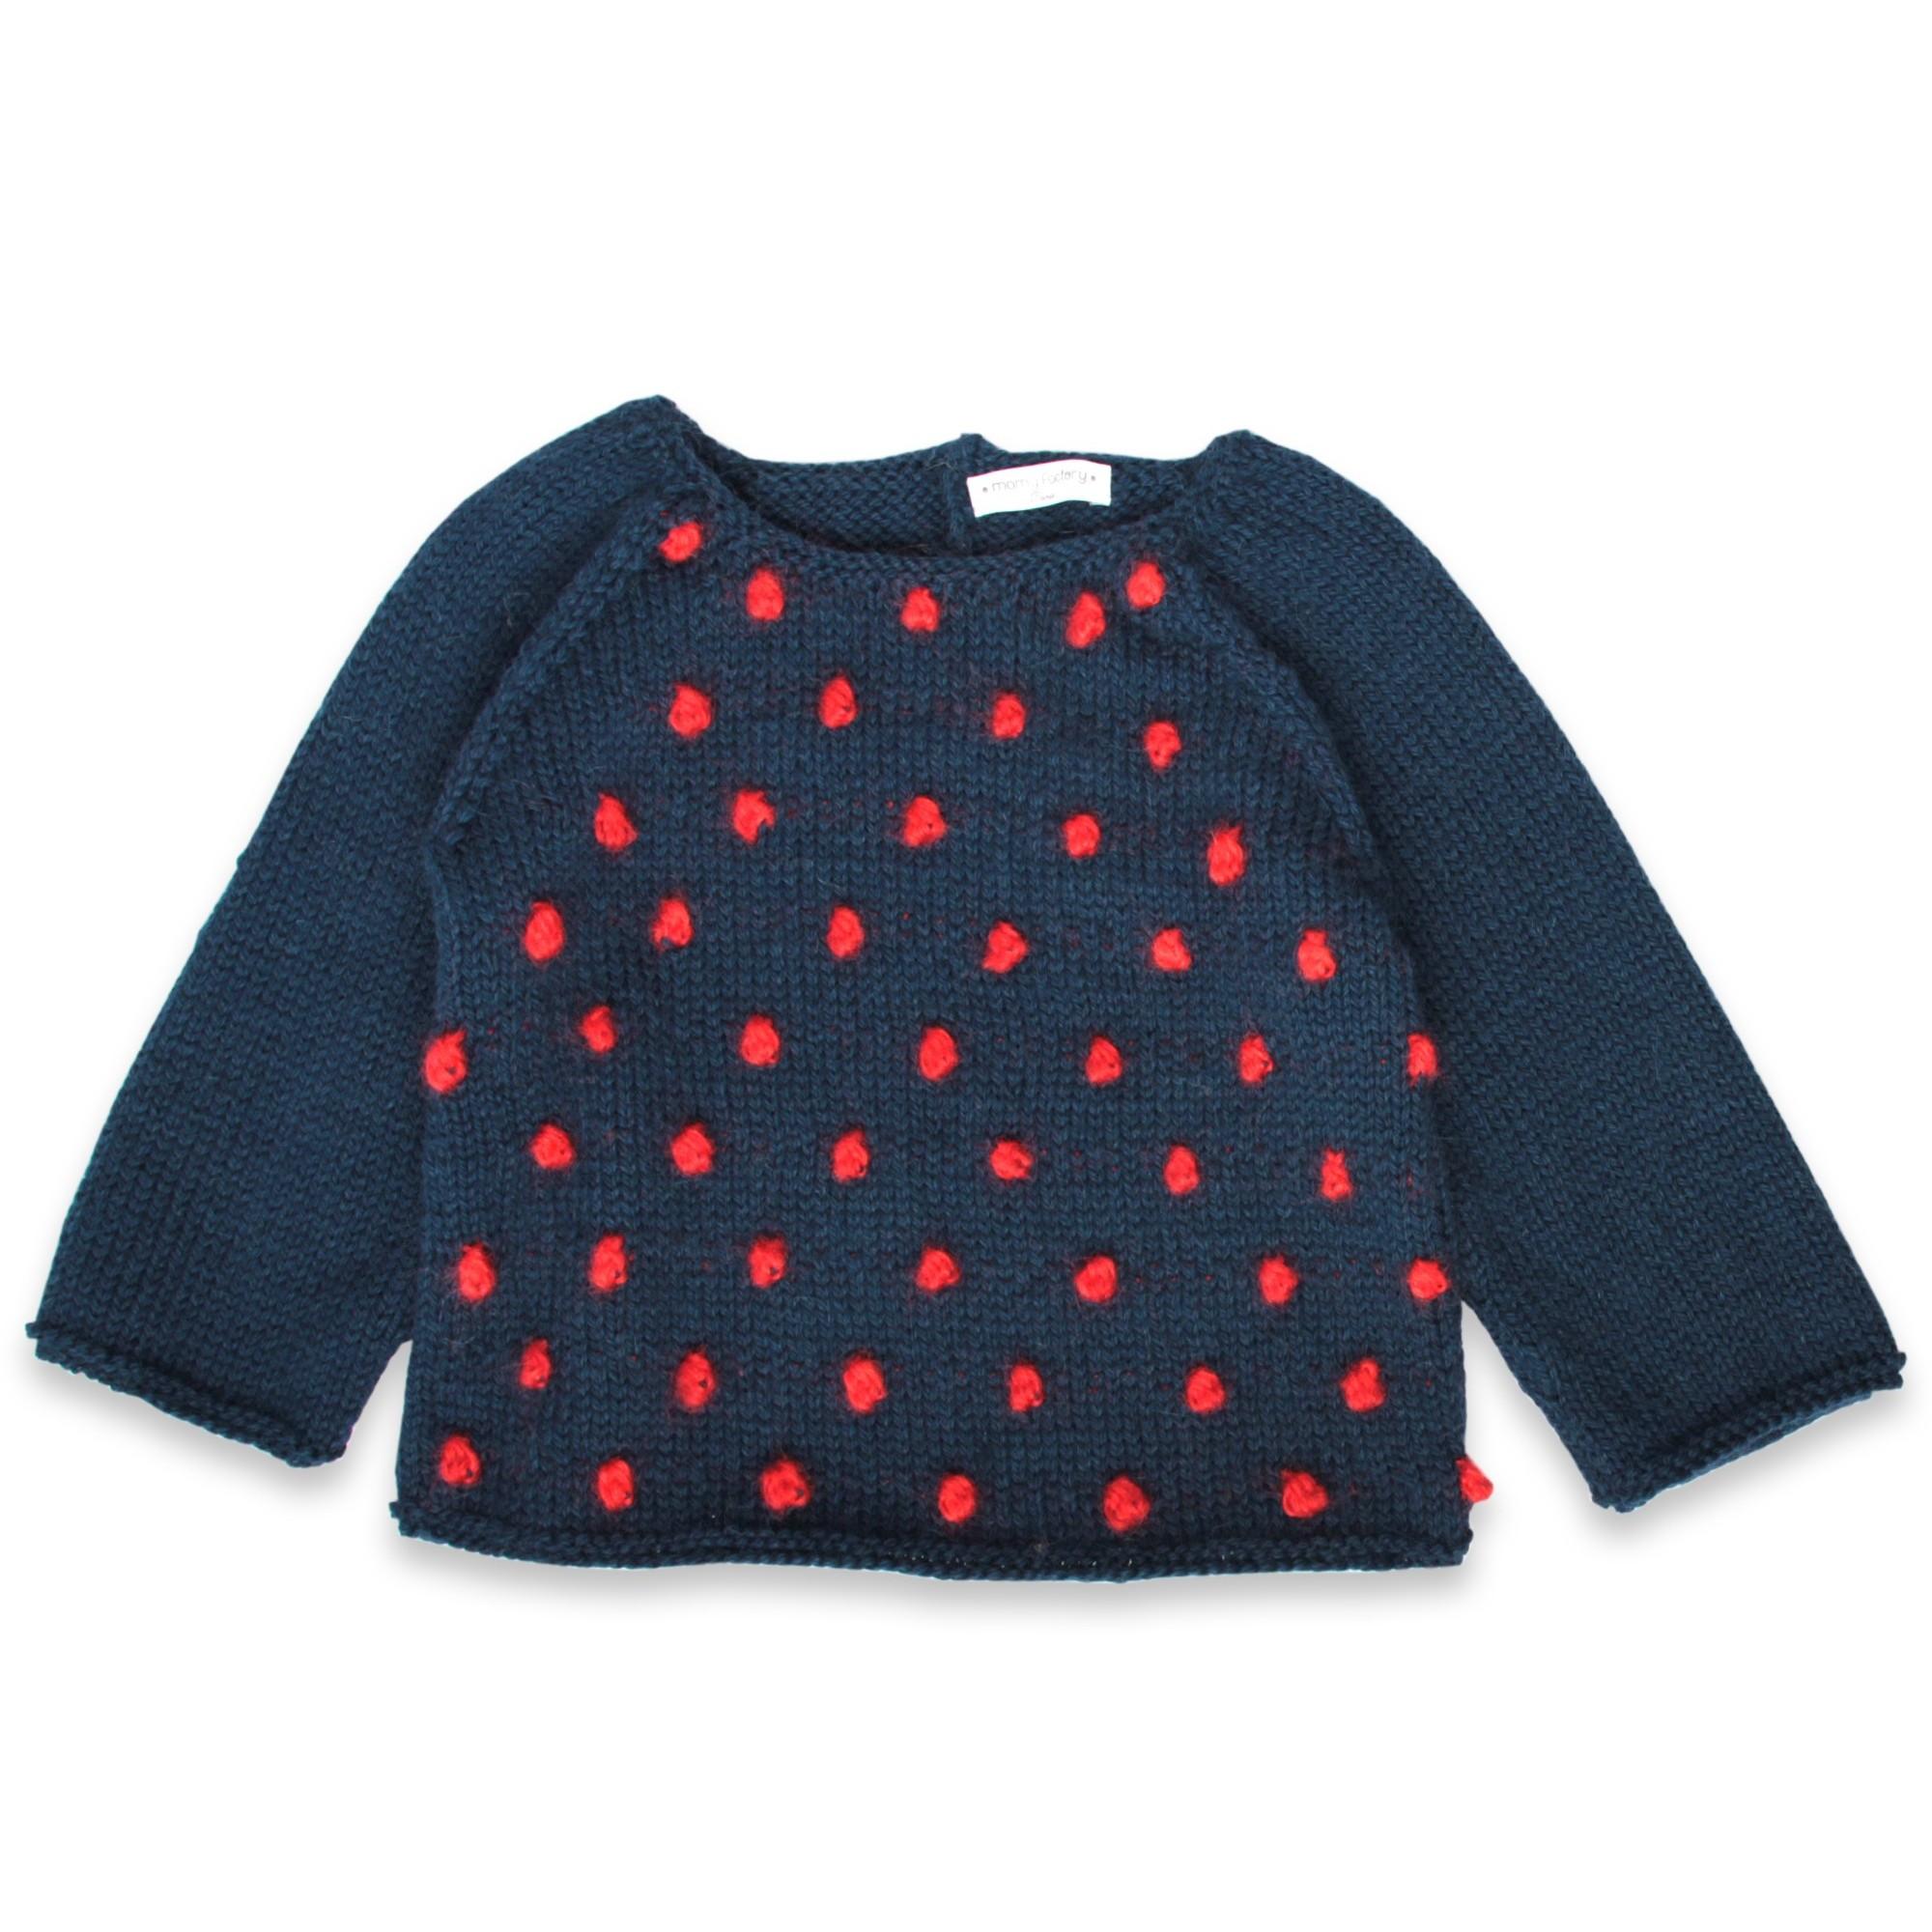 les tricots de mamy pull enfant marine avec petites. Black Bedroom Furniture Sets. Home Design Ideas